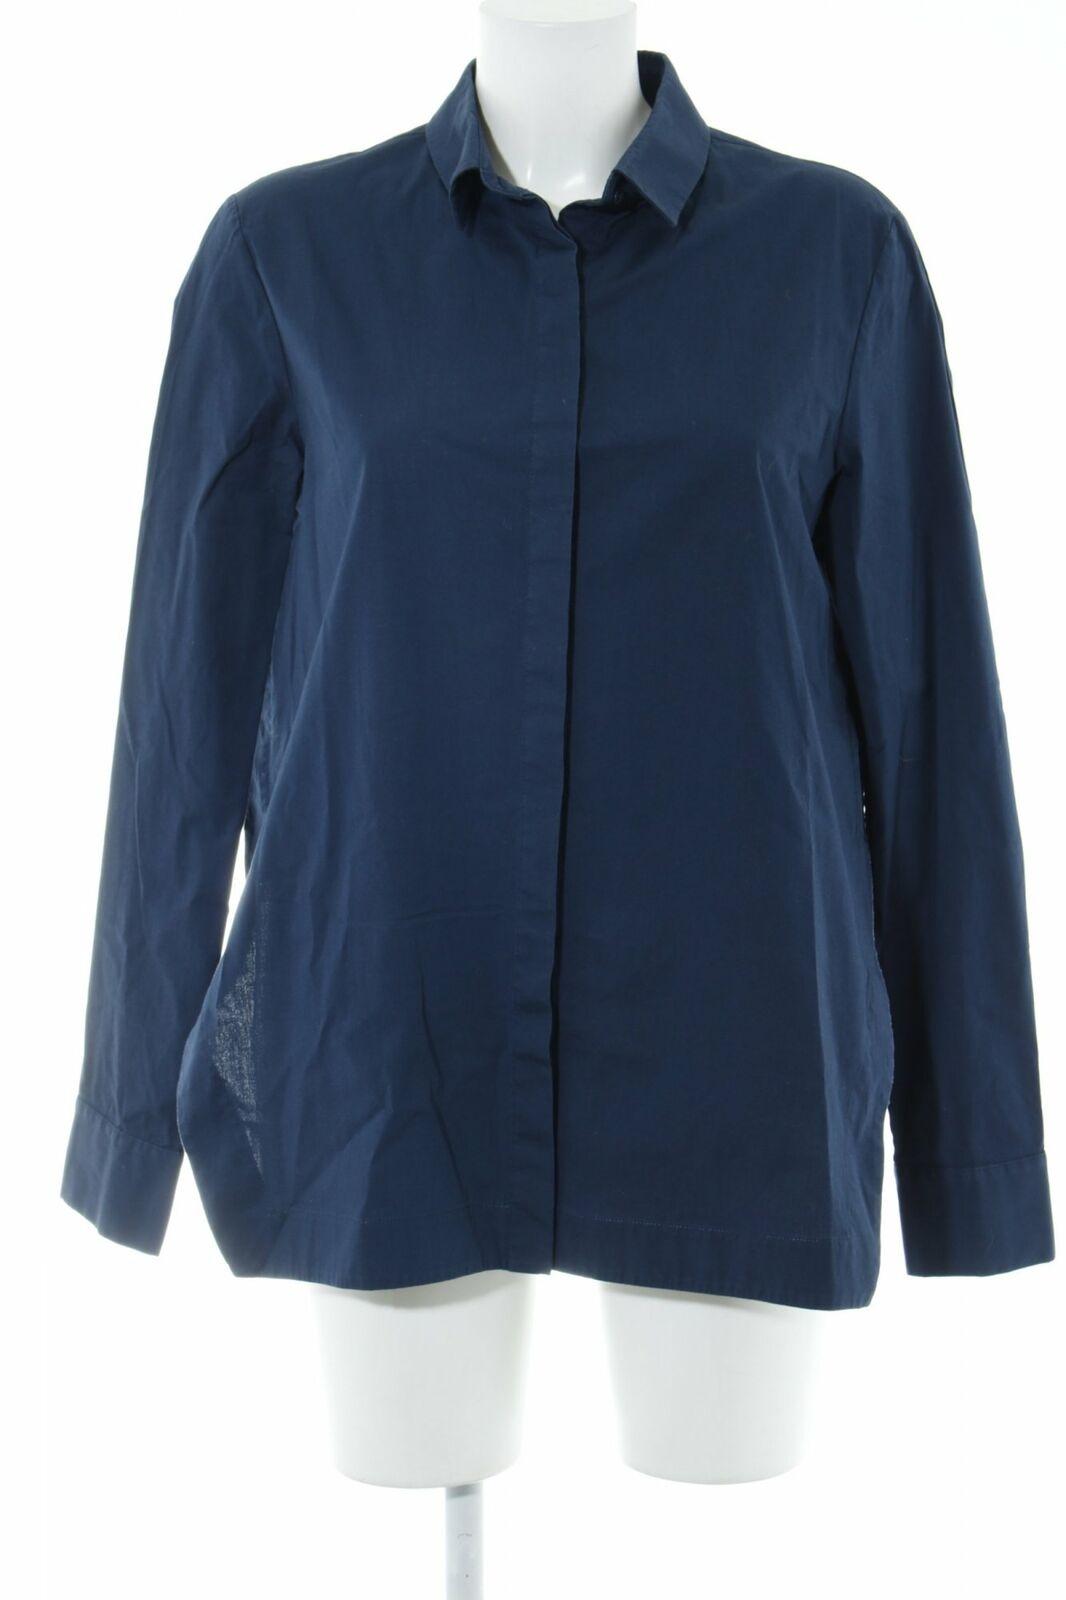 DGoldTHEE SCHUMACHER Langarmhemd dunkelblau Business-Look Damen Gr. DE 42 Hemd